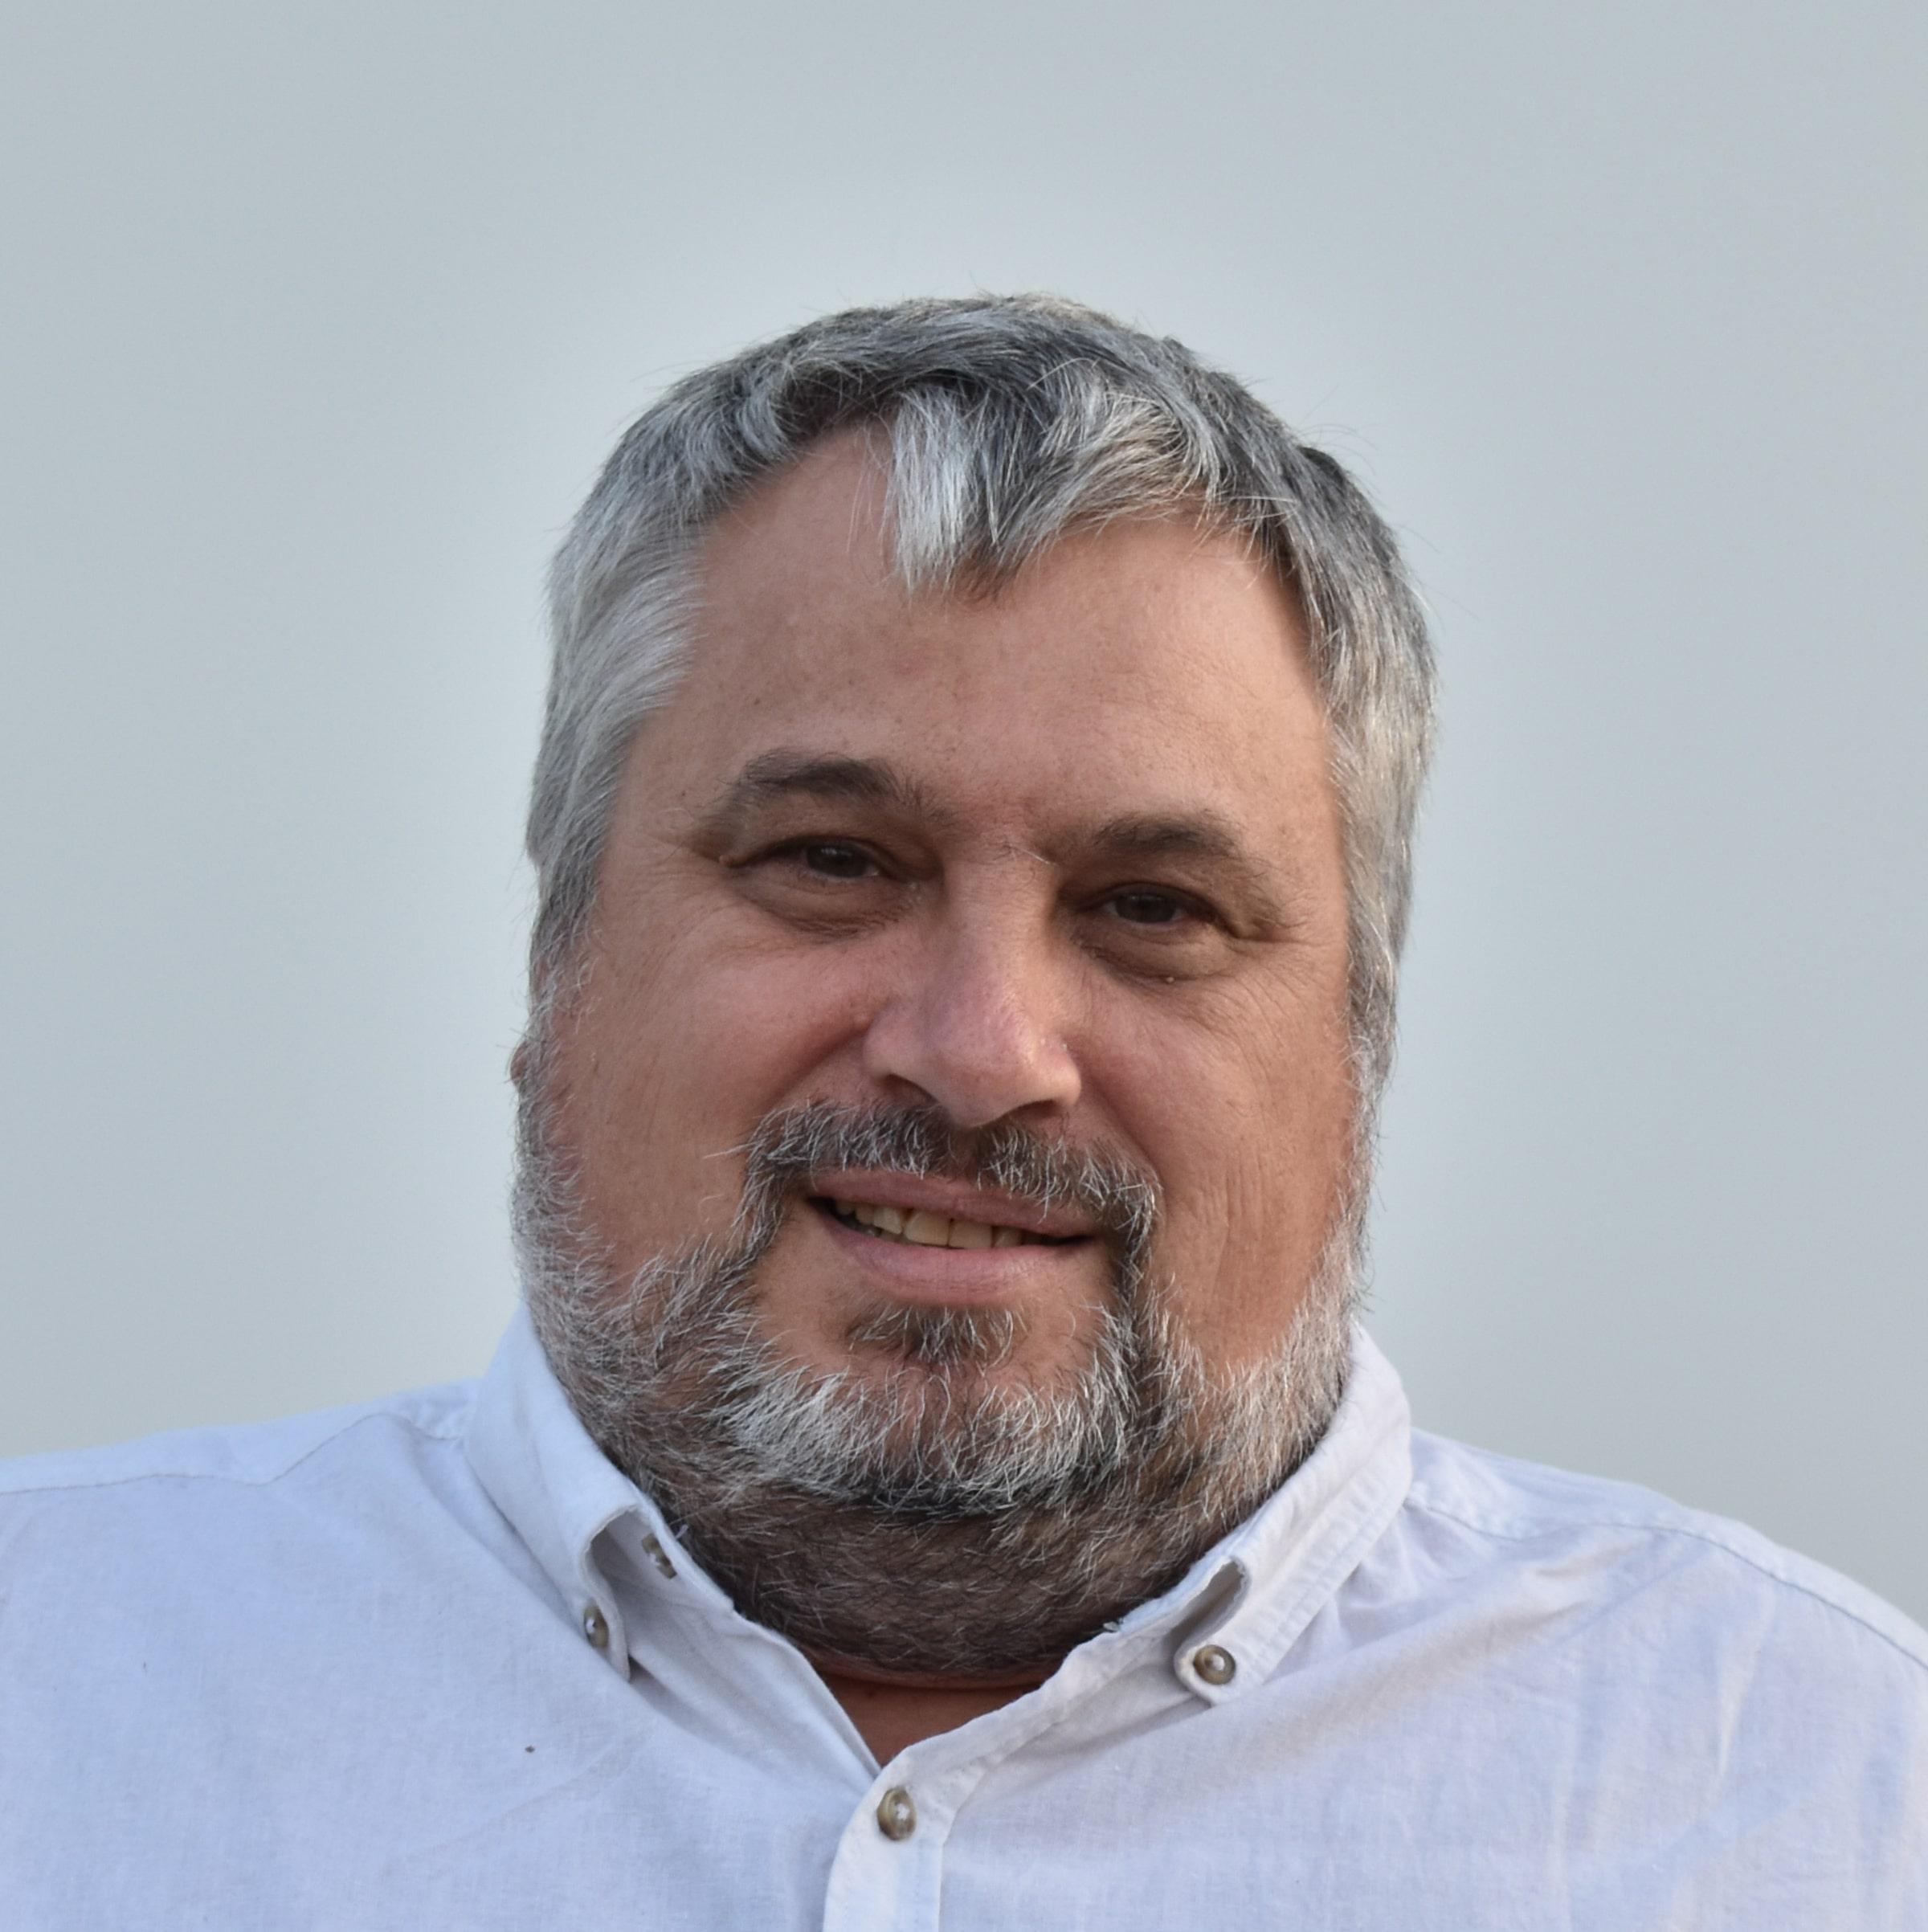 Fabien Goubard